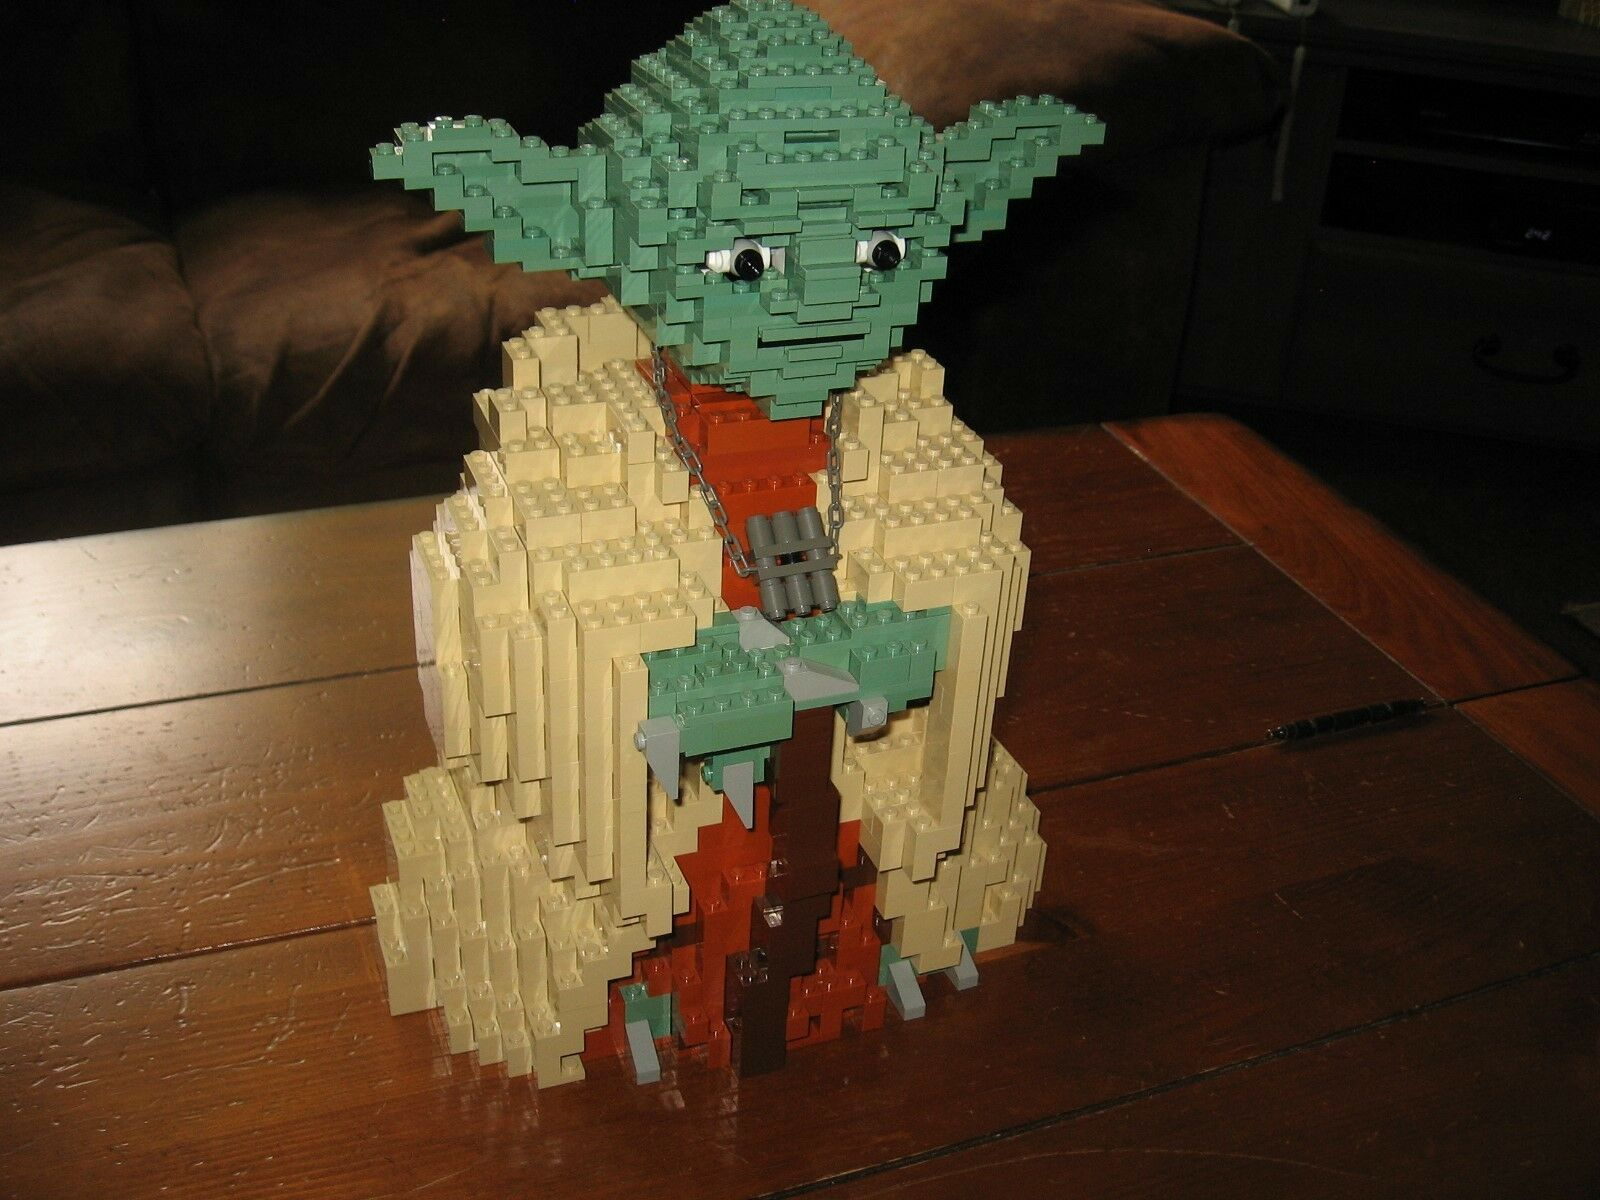 LEGO  YODA   UCS  7194  THE MIGHTY YODA AWESOME     vendite online